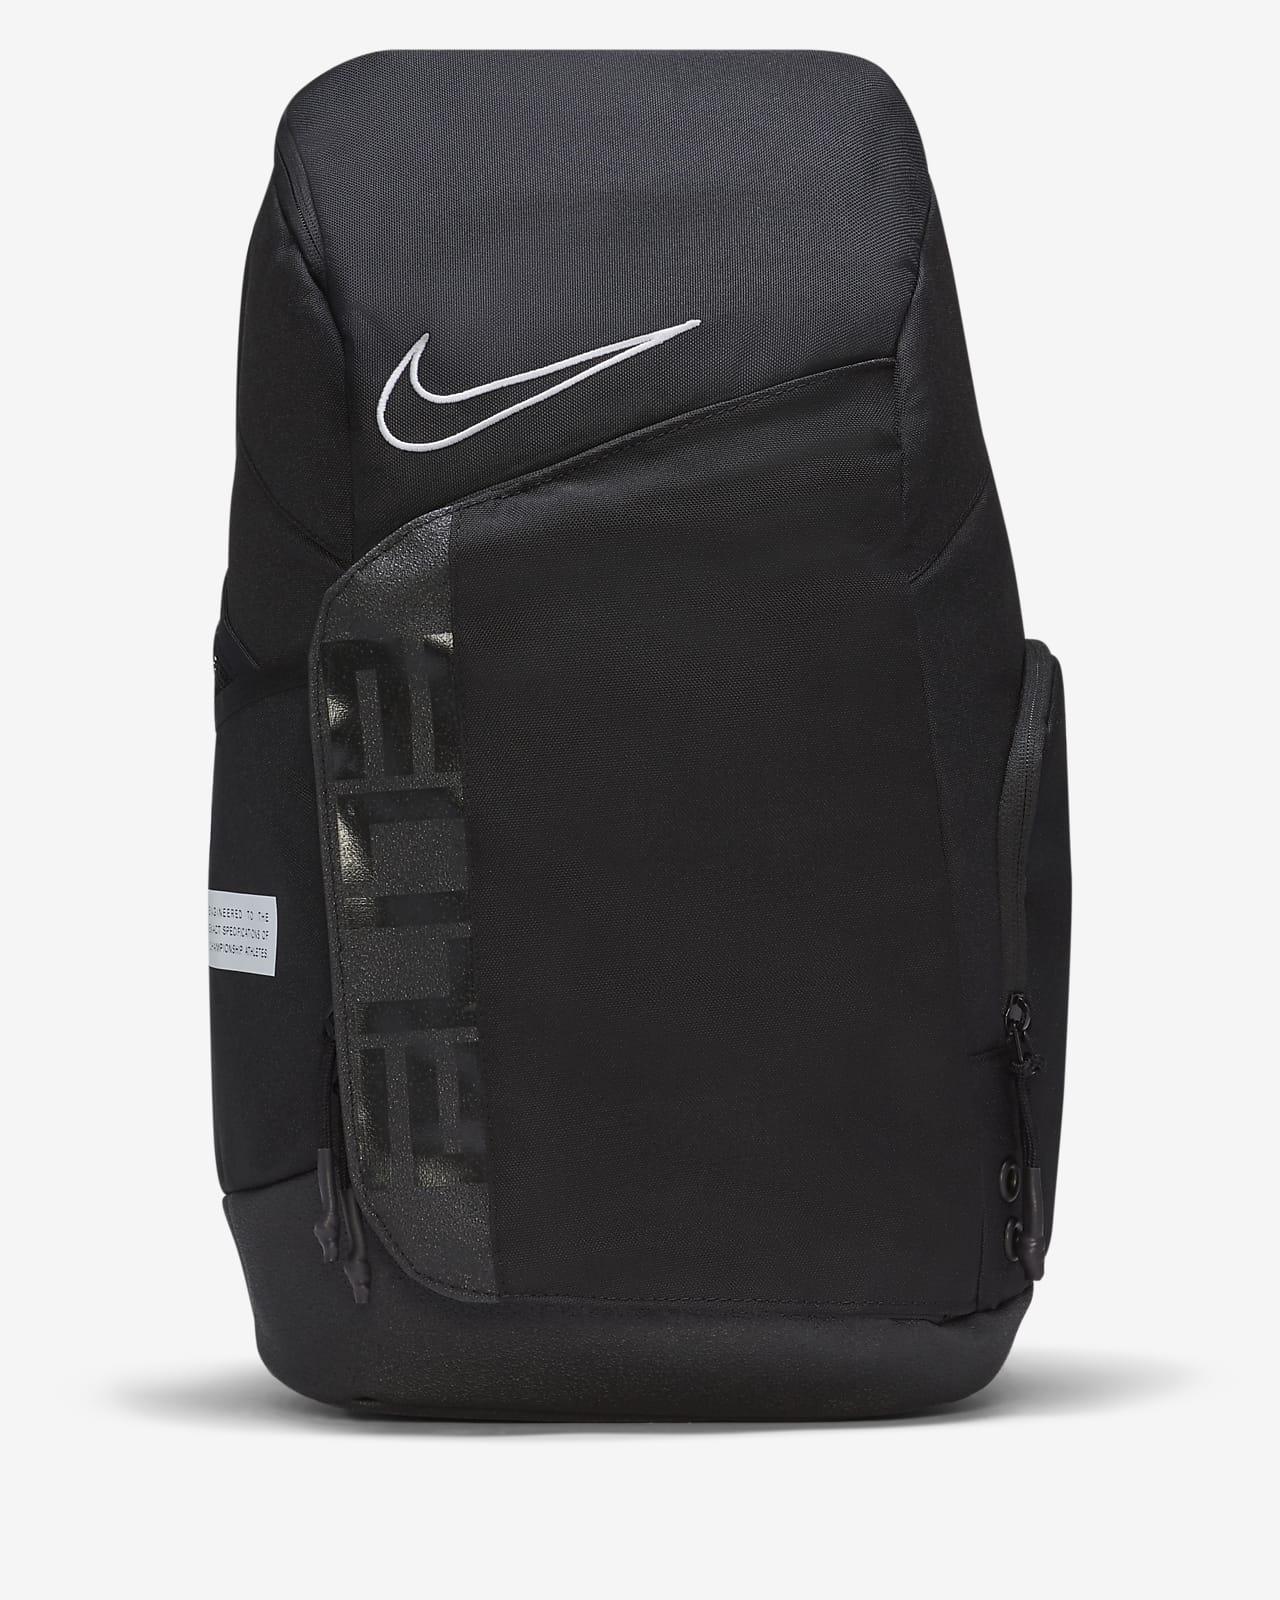 Nike Elite Pro Small Basketball